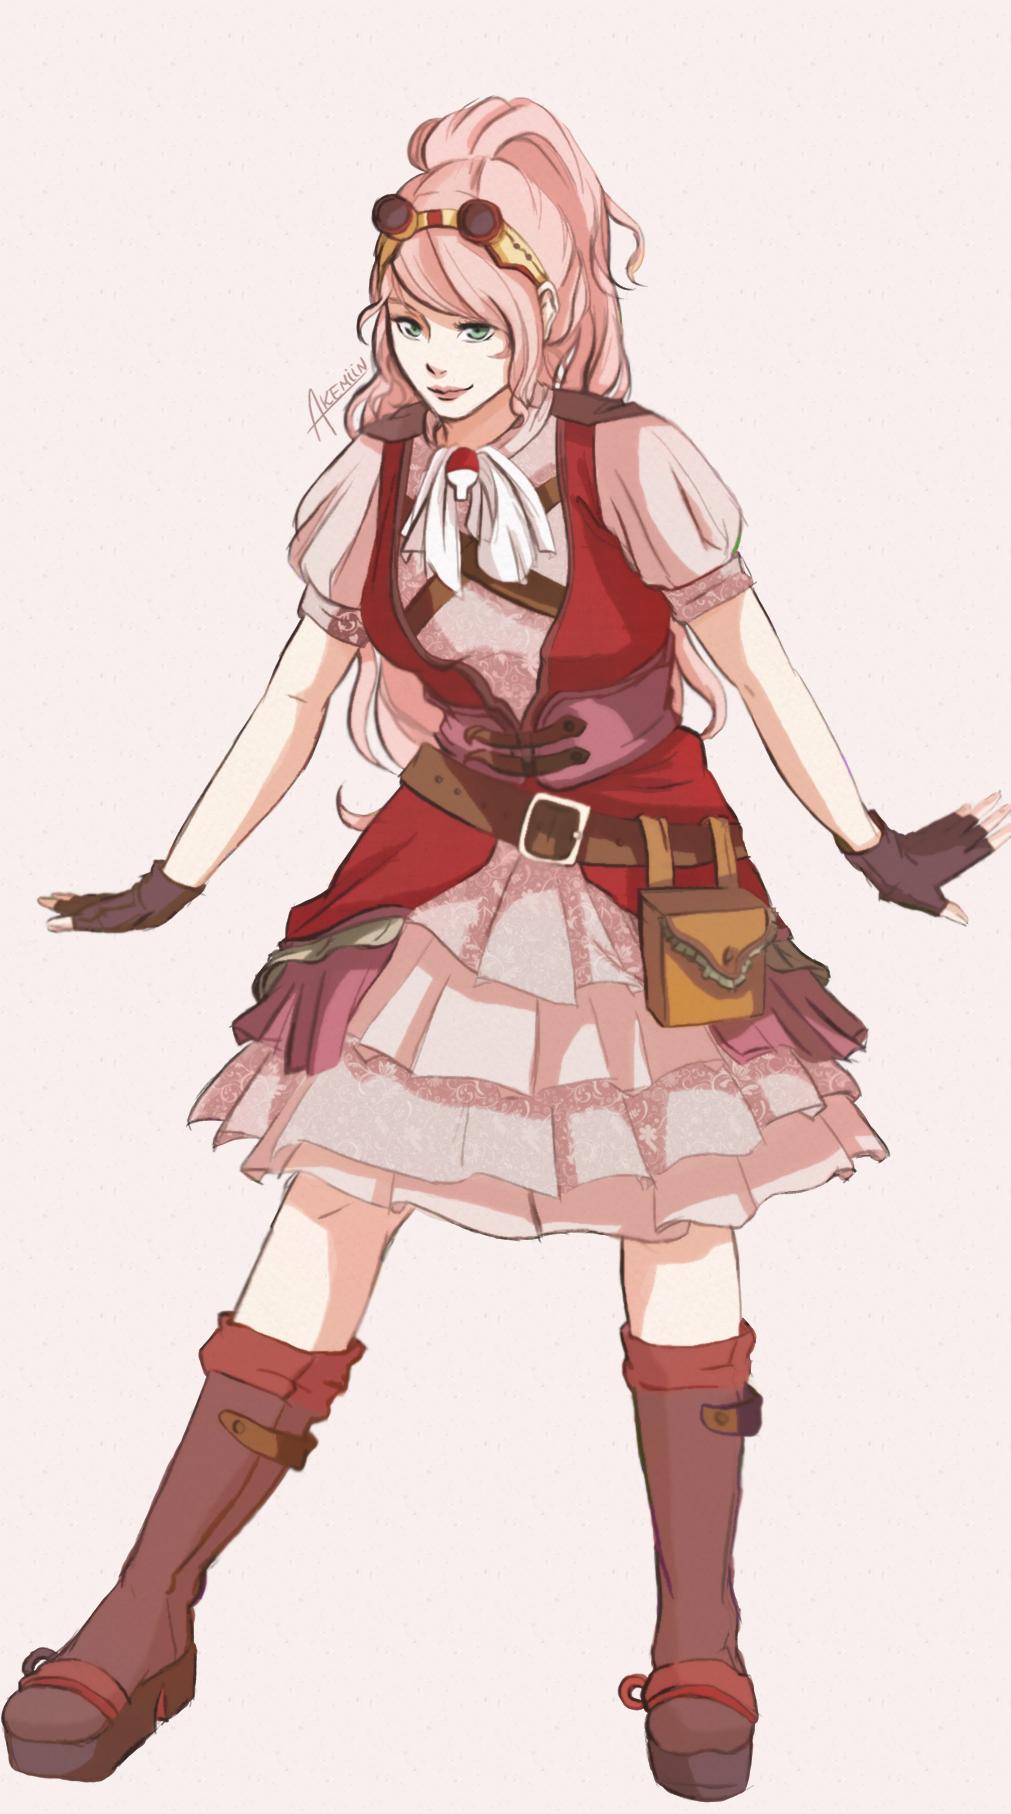 http://static.zerochan.net/Haruno.Sakura.full.1855937.jpg